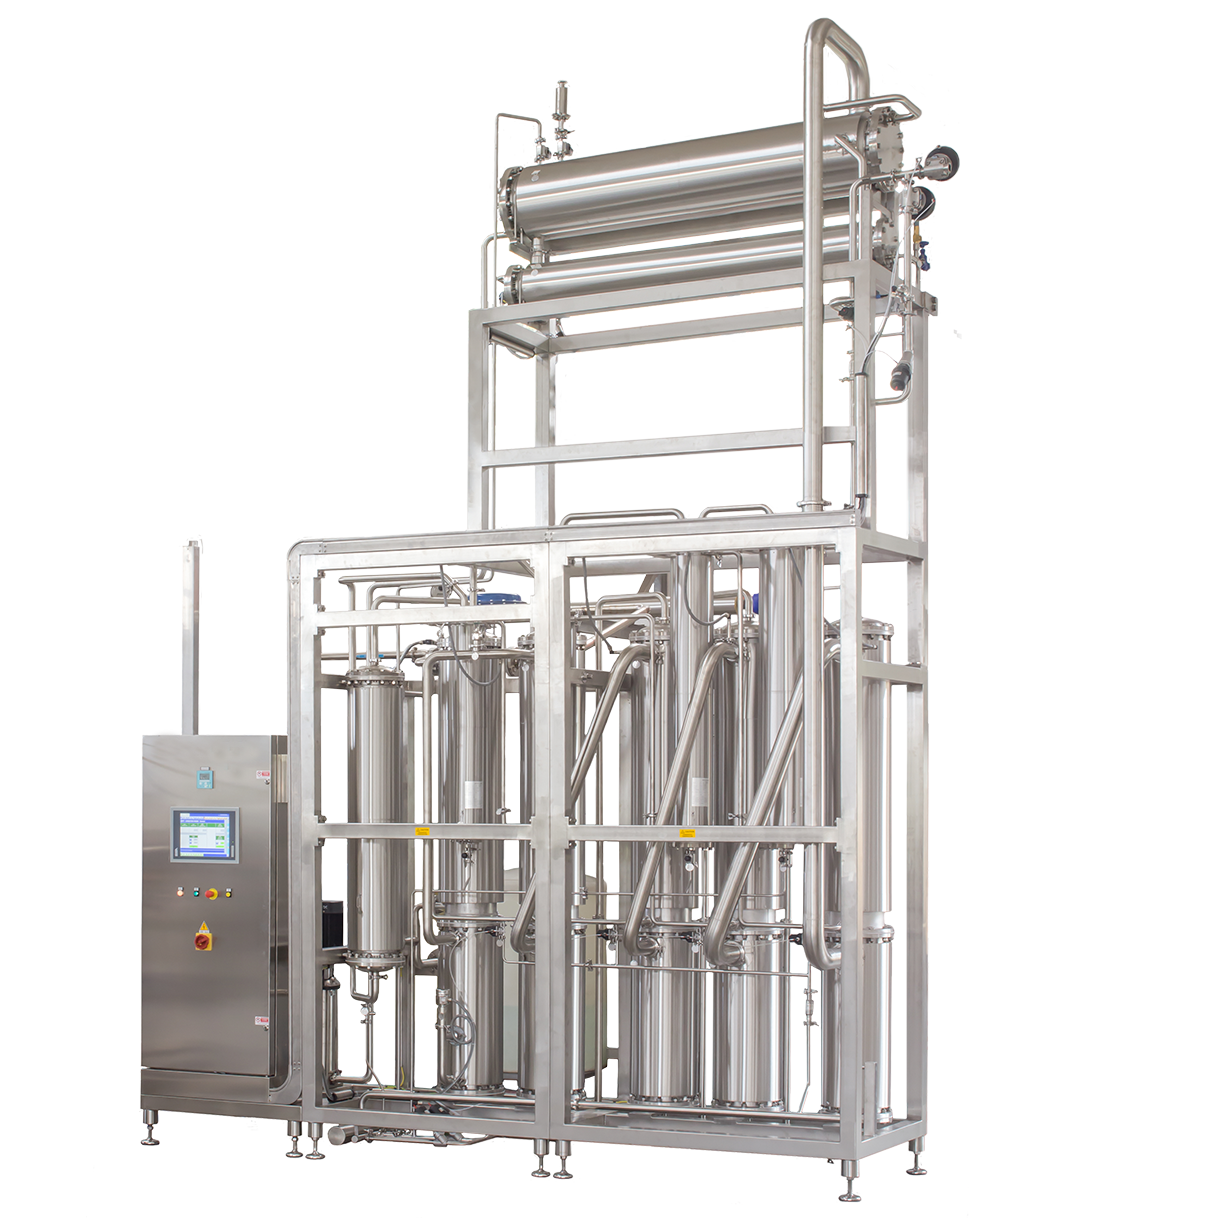 دستگاه تقطیر آب قابل تزریق Pharmalab